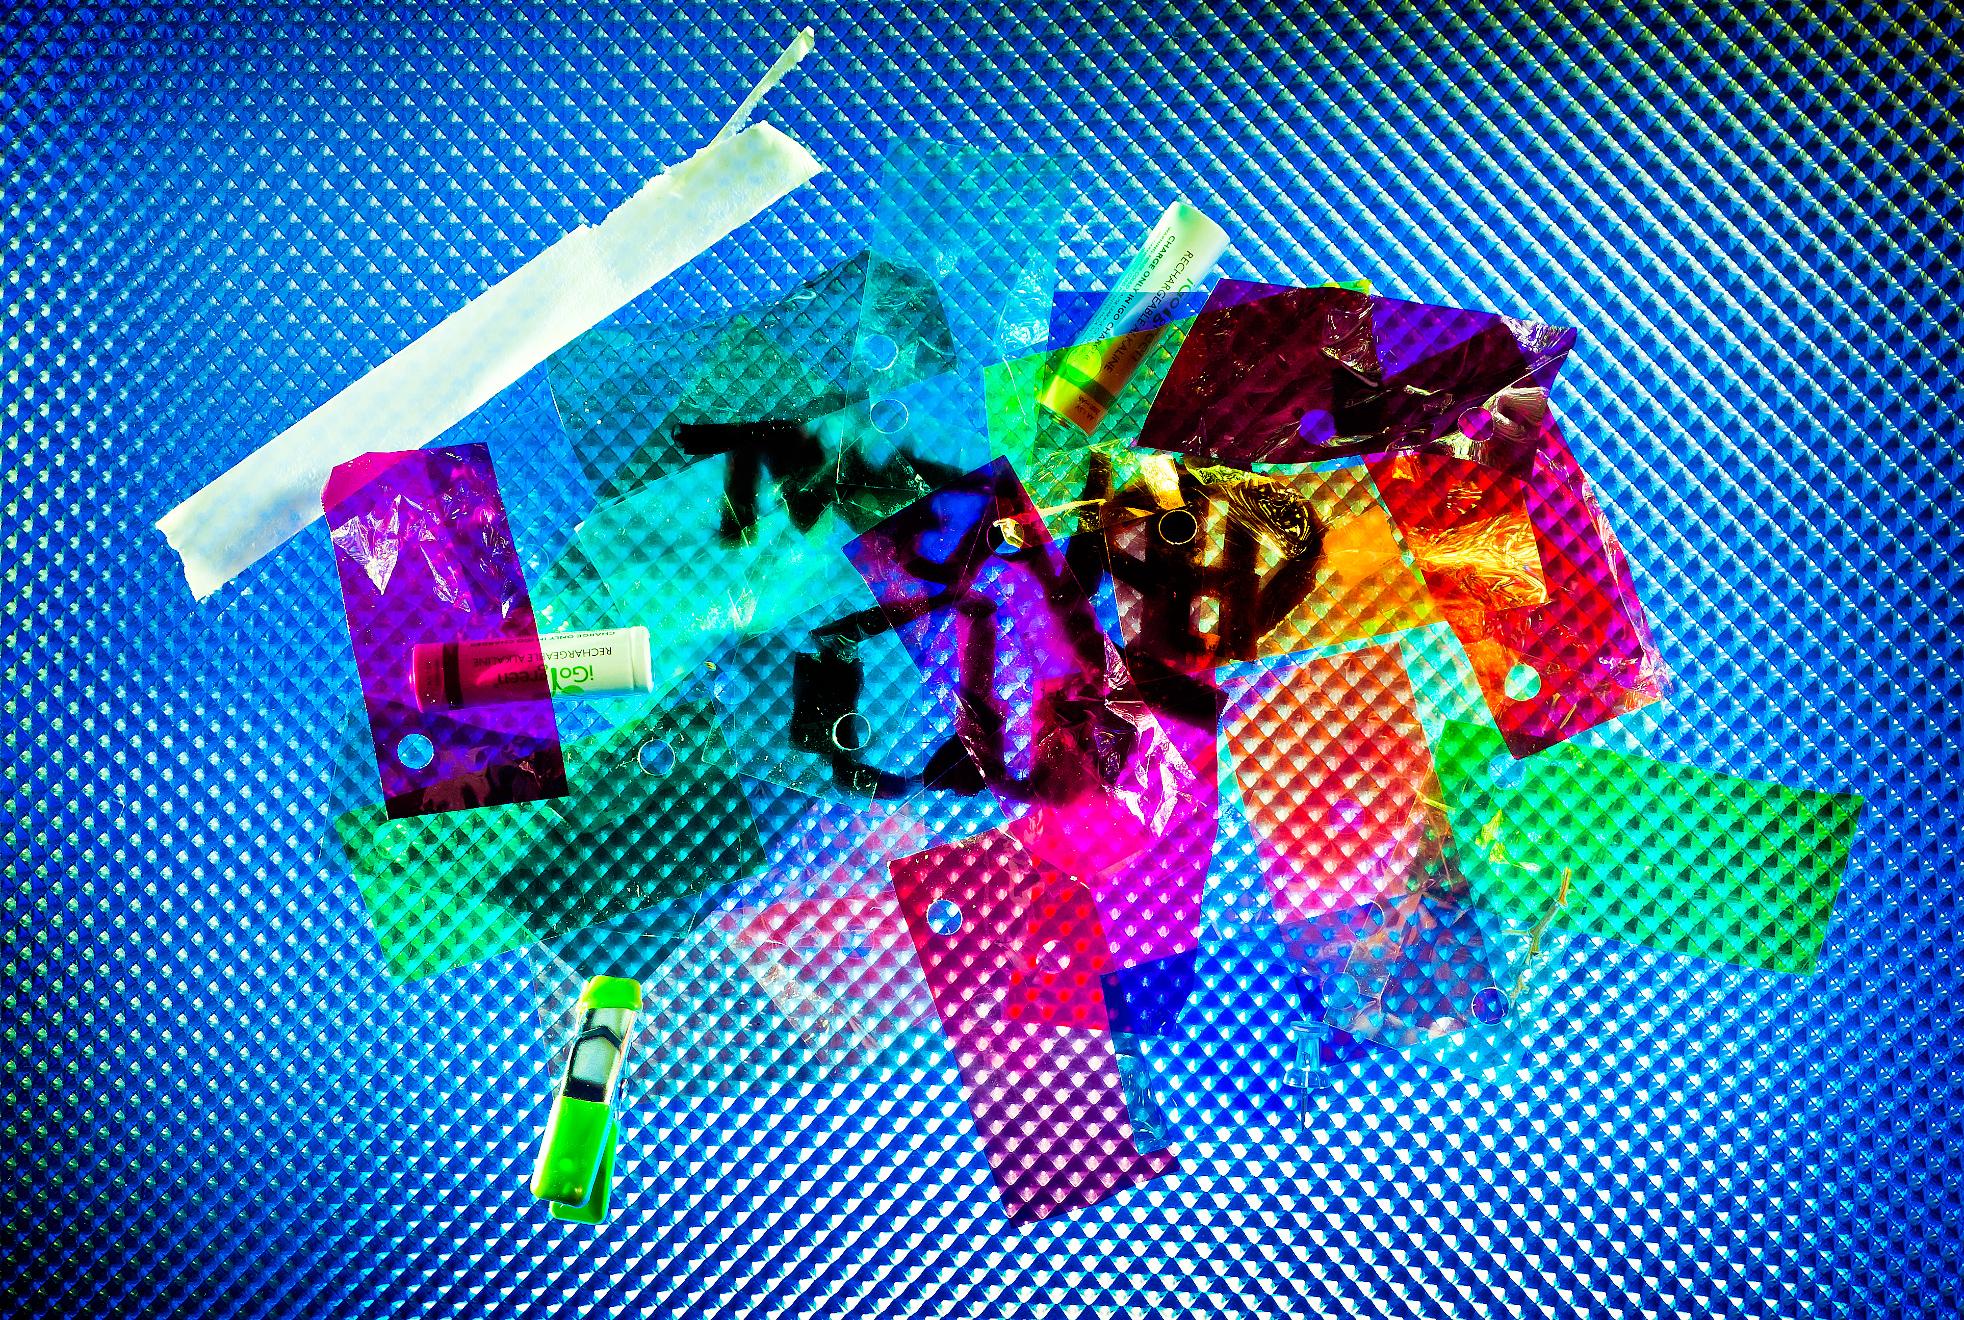 Tweak'd Out photo series title card; 2012